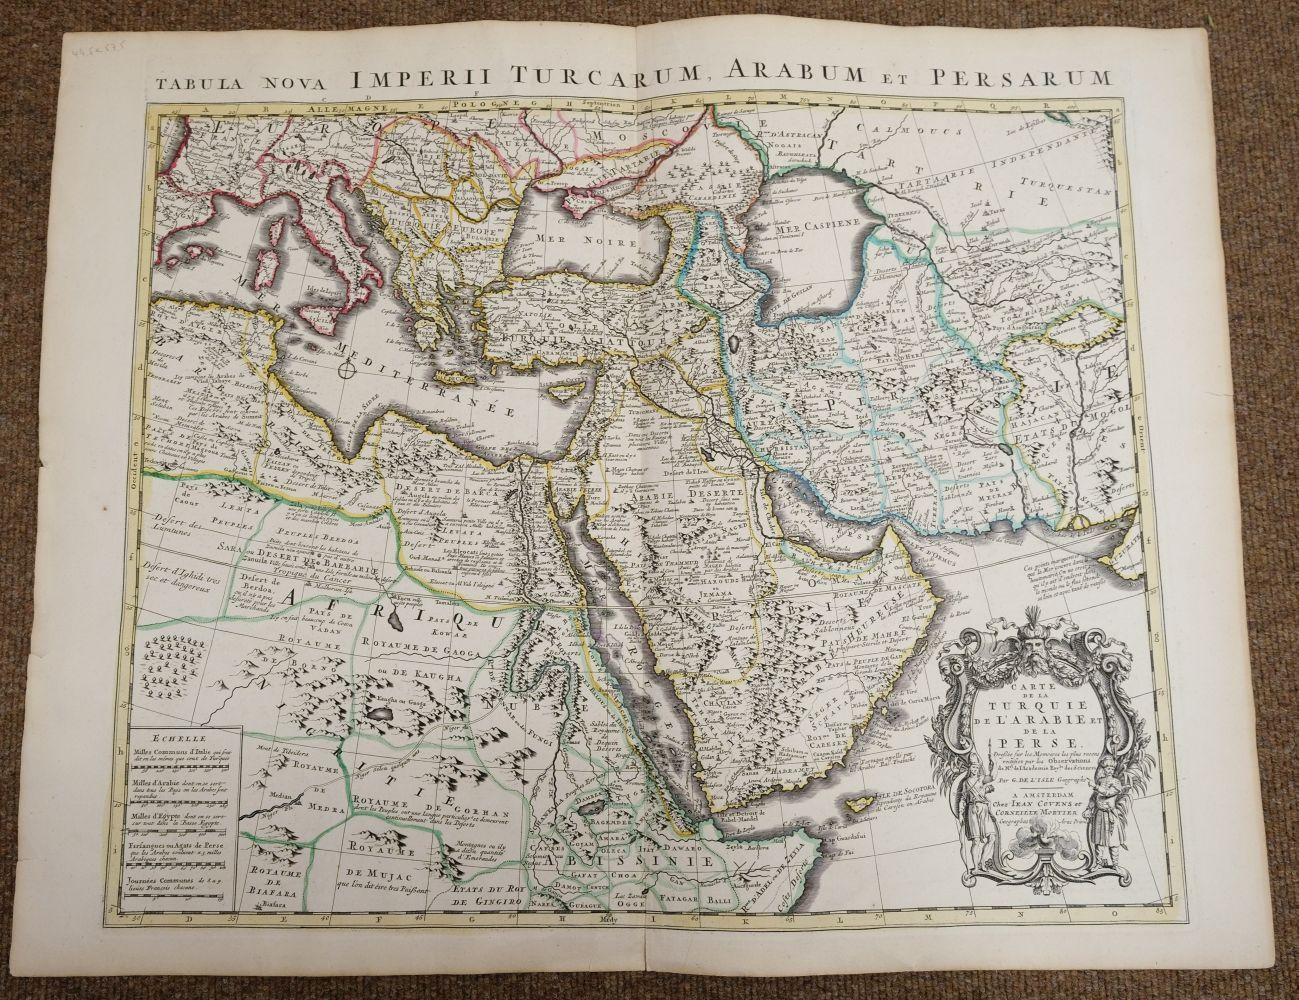 Holy Land. Ottens (R. & J.), Het Beloofde Landt Israels. Terra Sancta..., Amsterdam, circa 1765 - Image 4 of 10